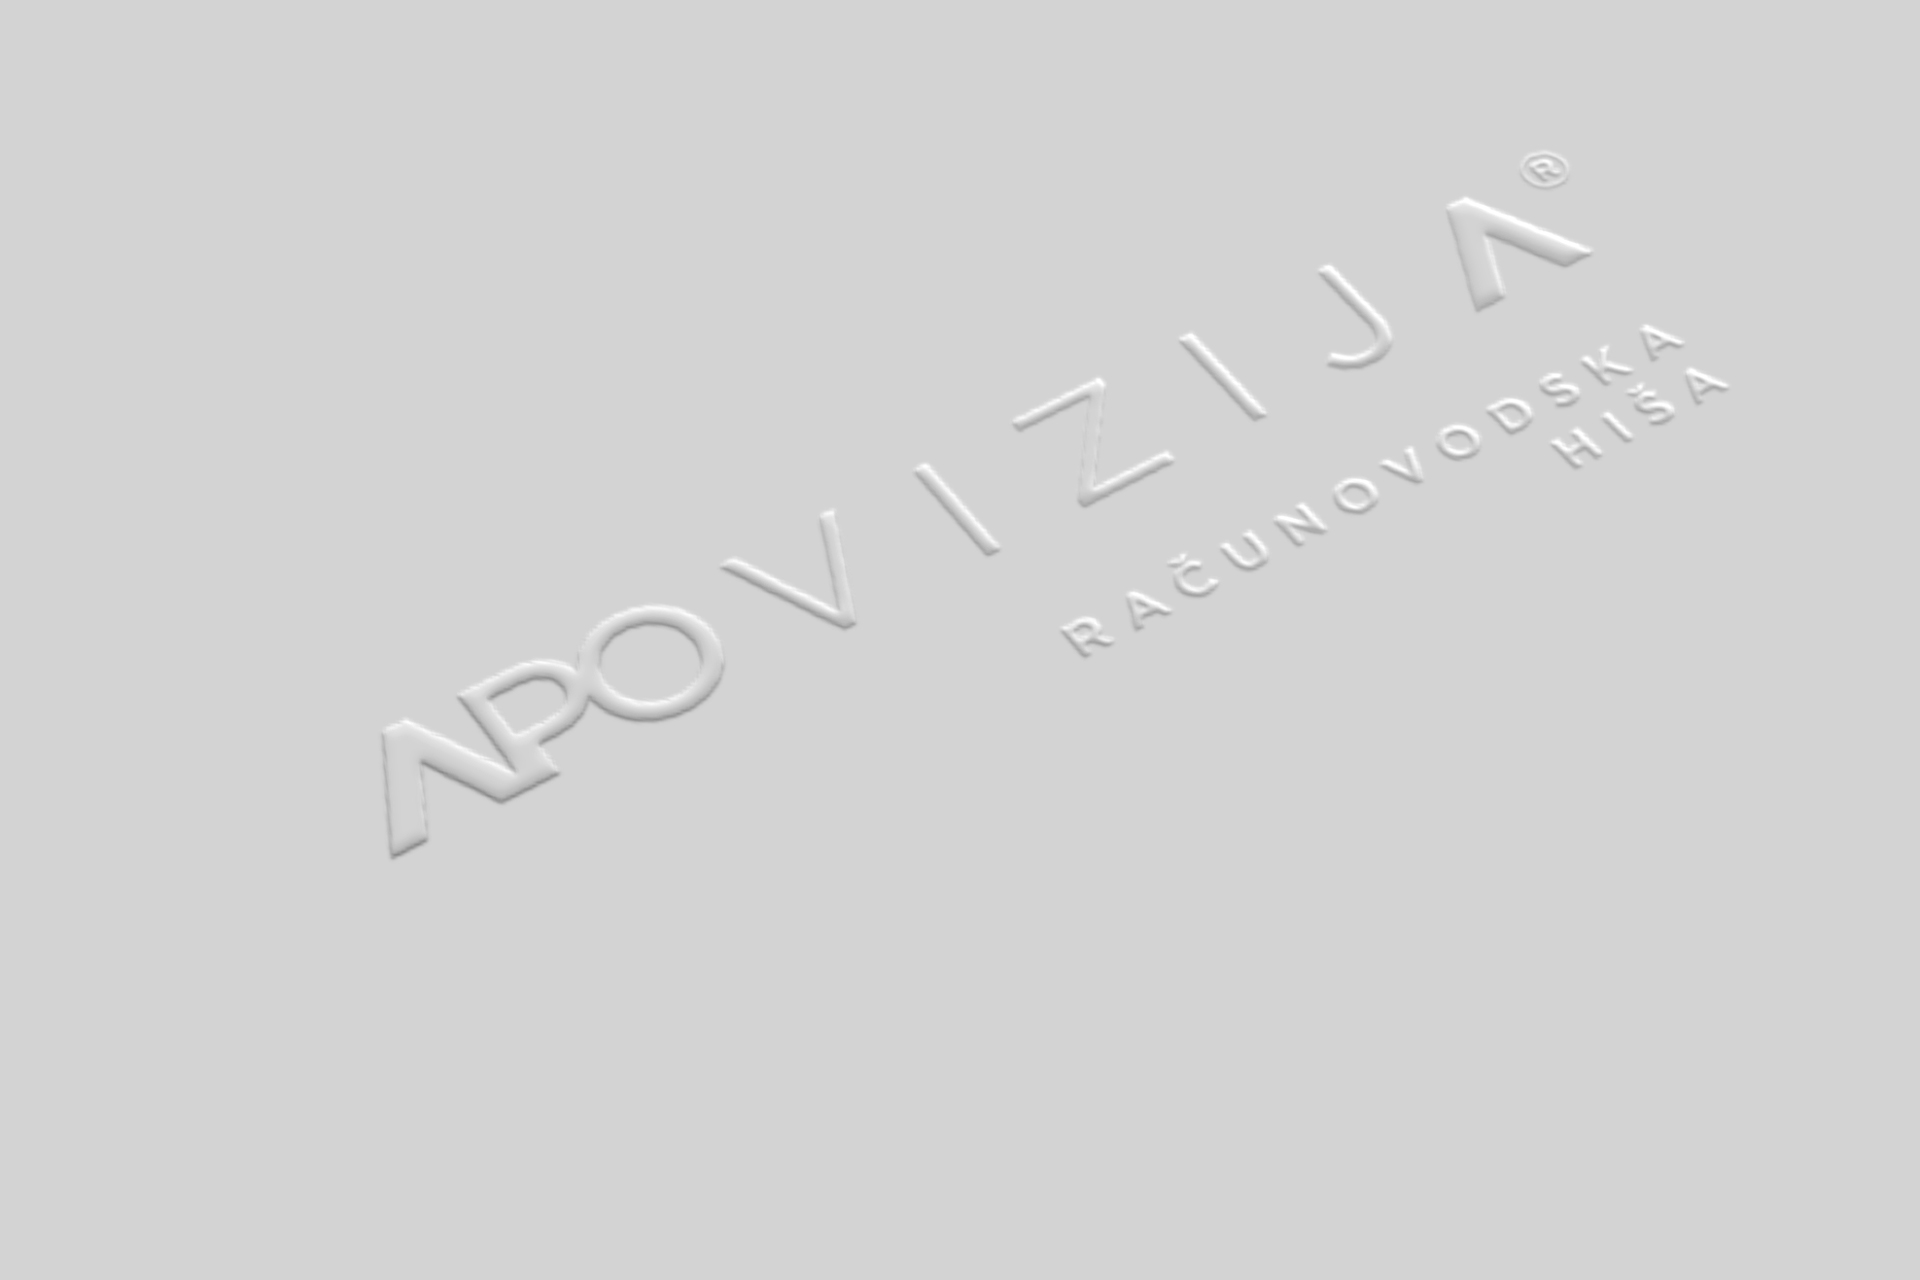 apo_vizija_logo_emboss_ma-ma_marinsek_2